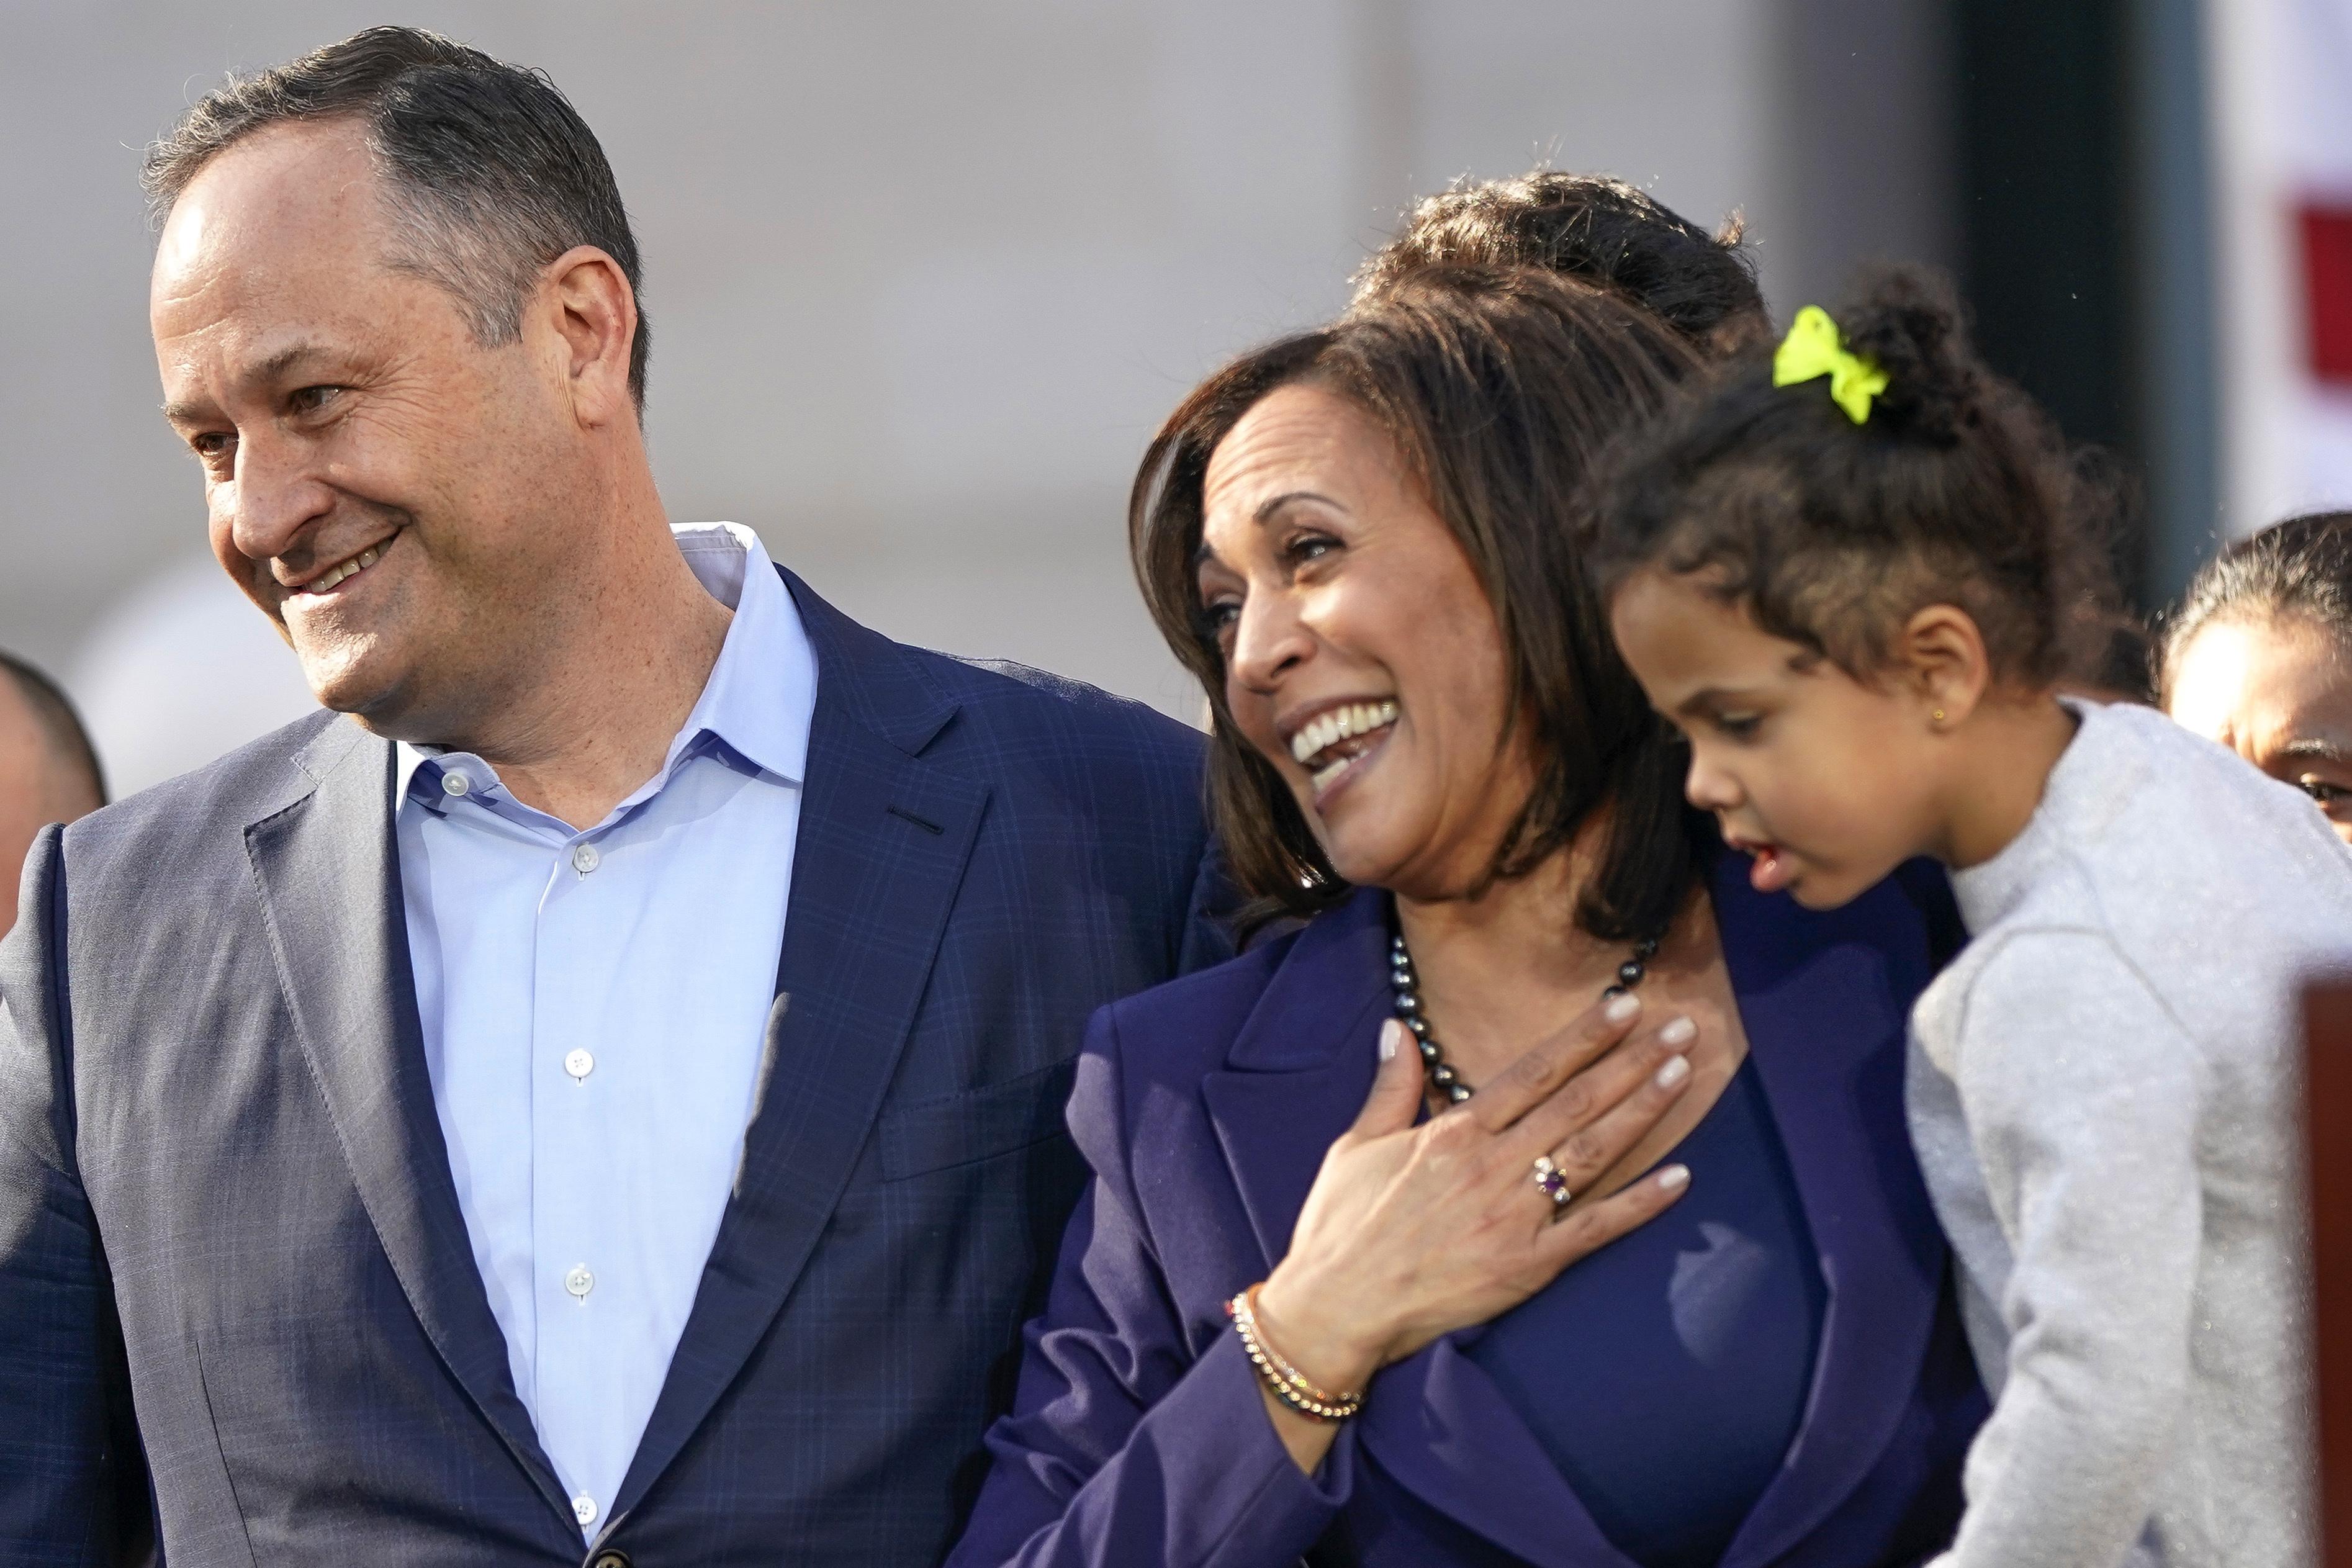 Harris' husband takes on growing public role in 2020 race ...